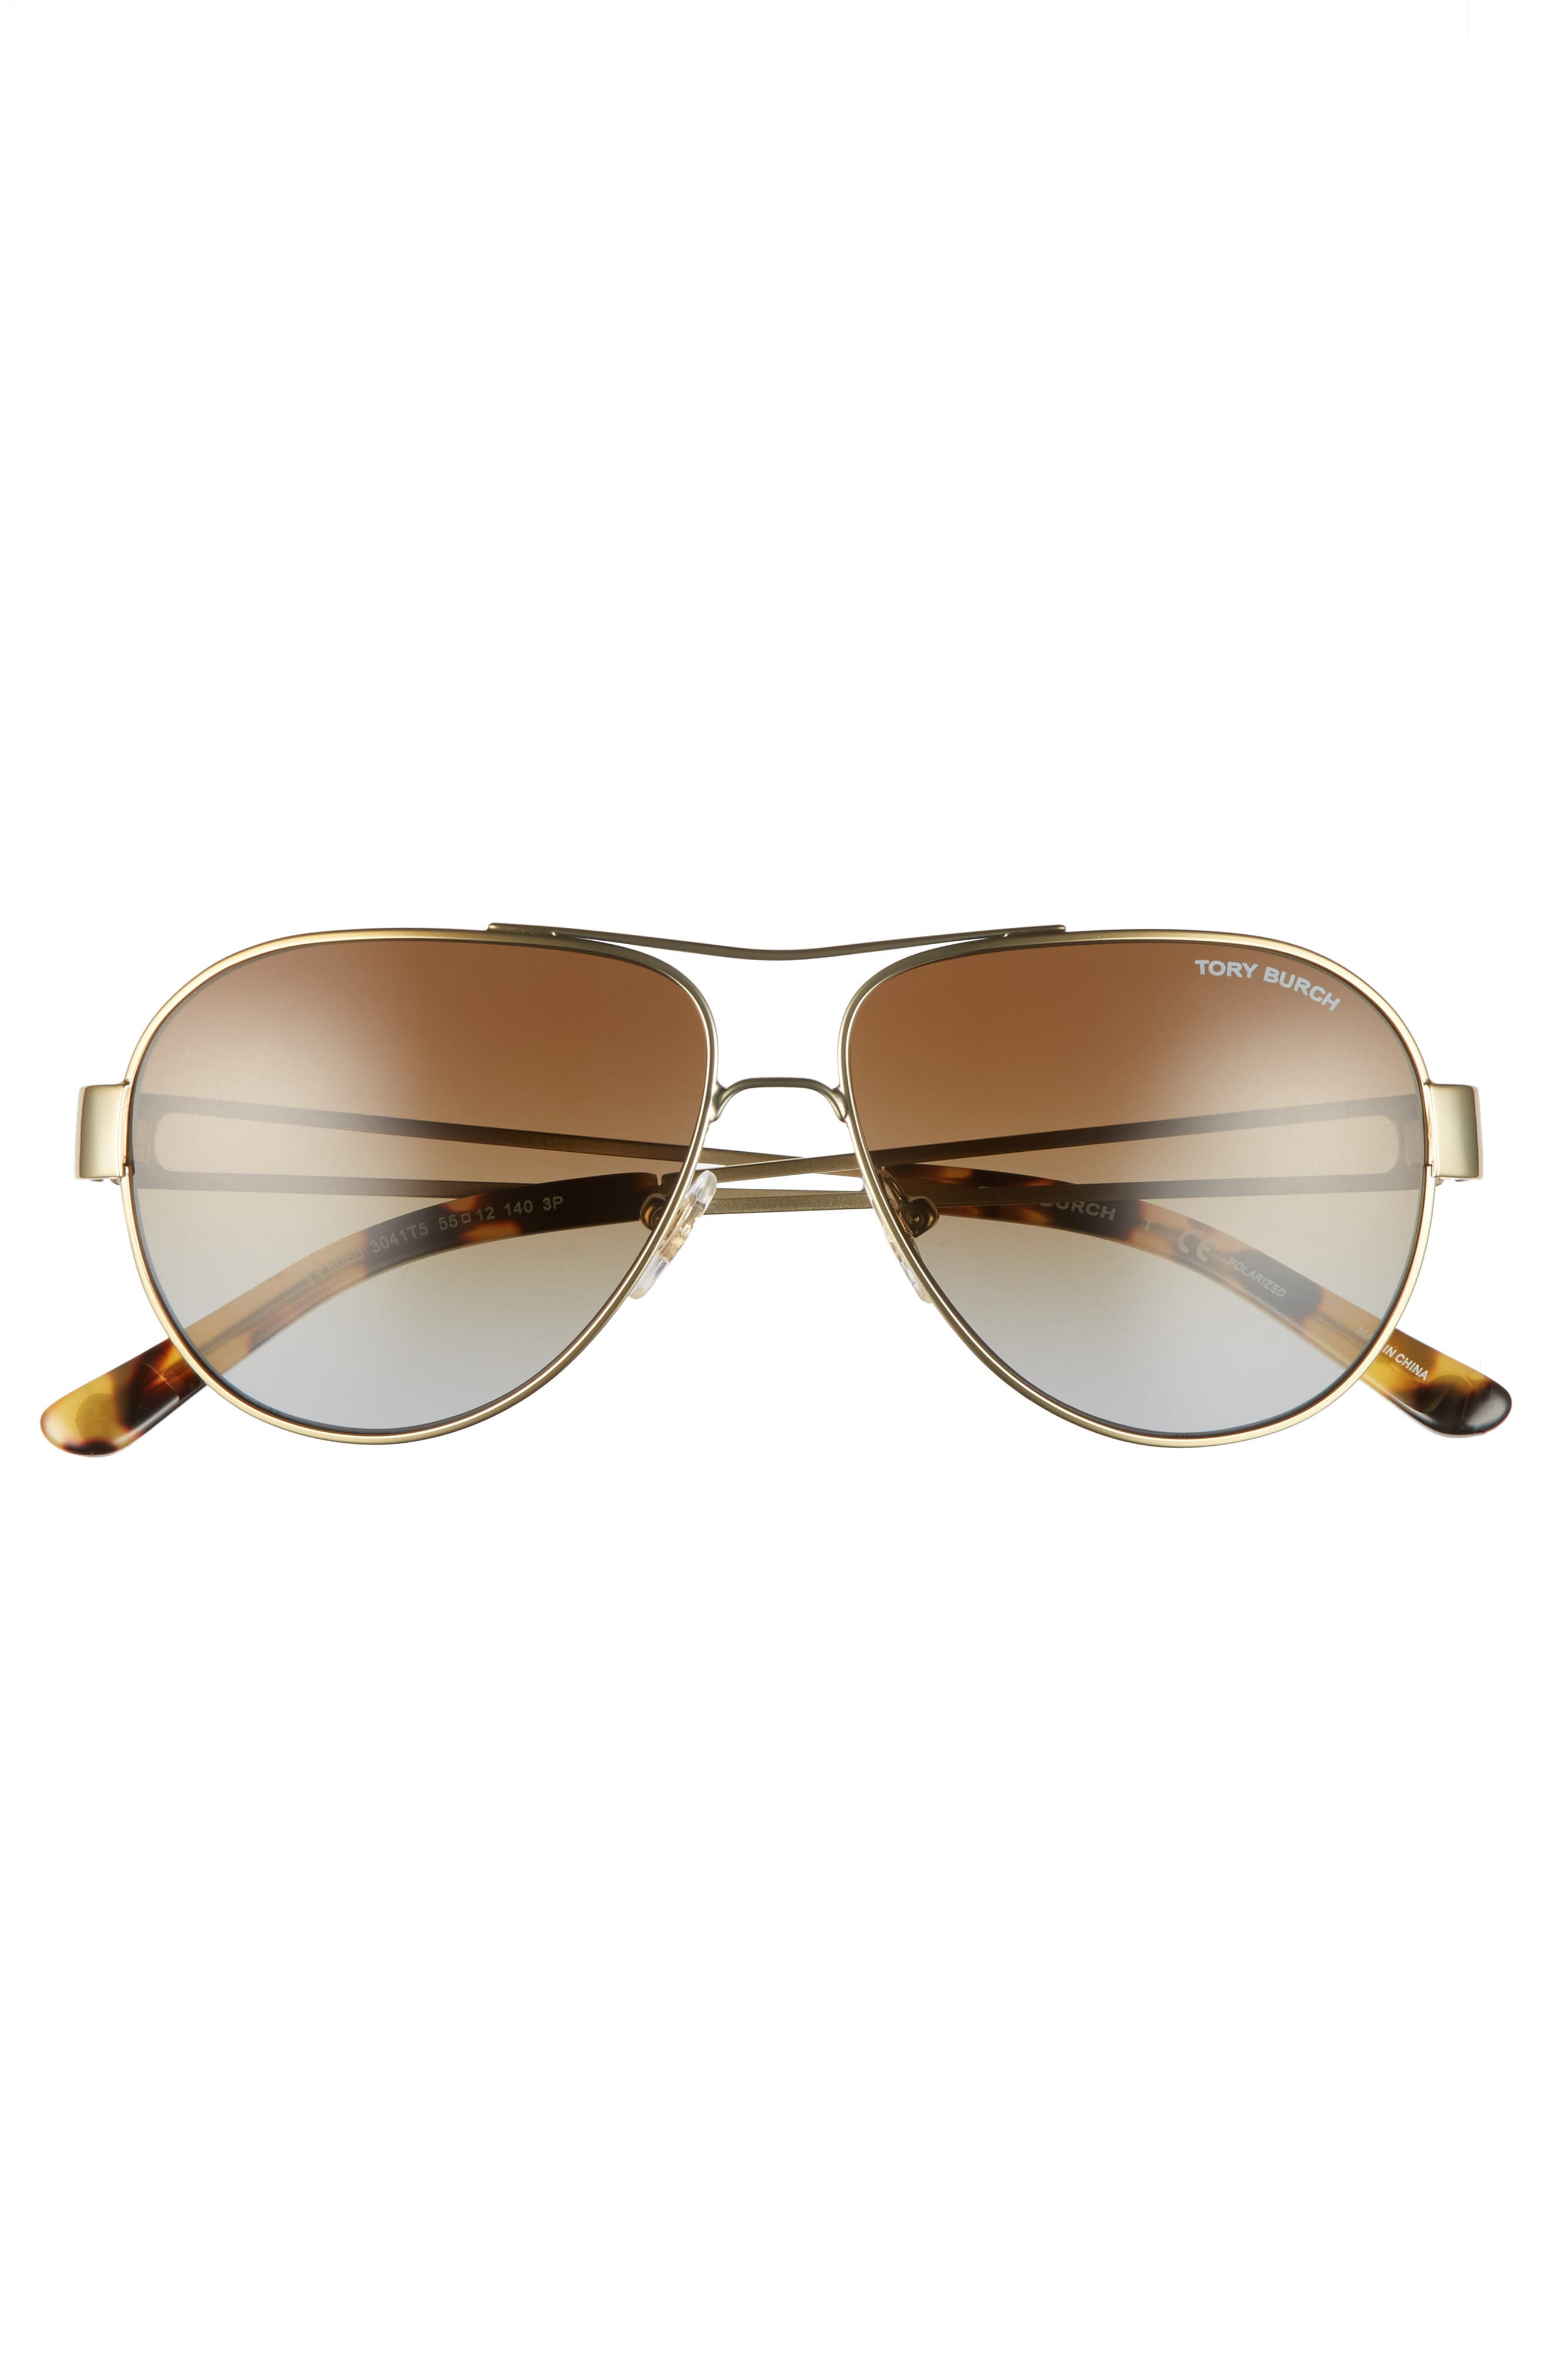 55mm Polarized Aviator Sunglasses,                             Alternate thumbnail 14, color,